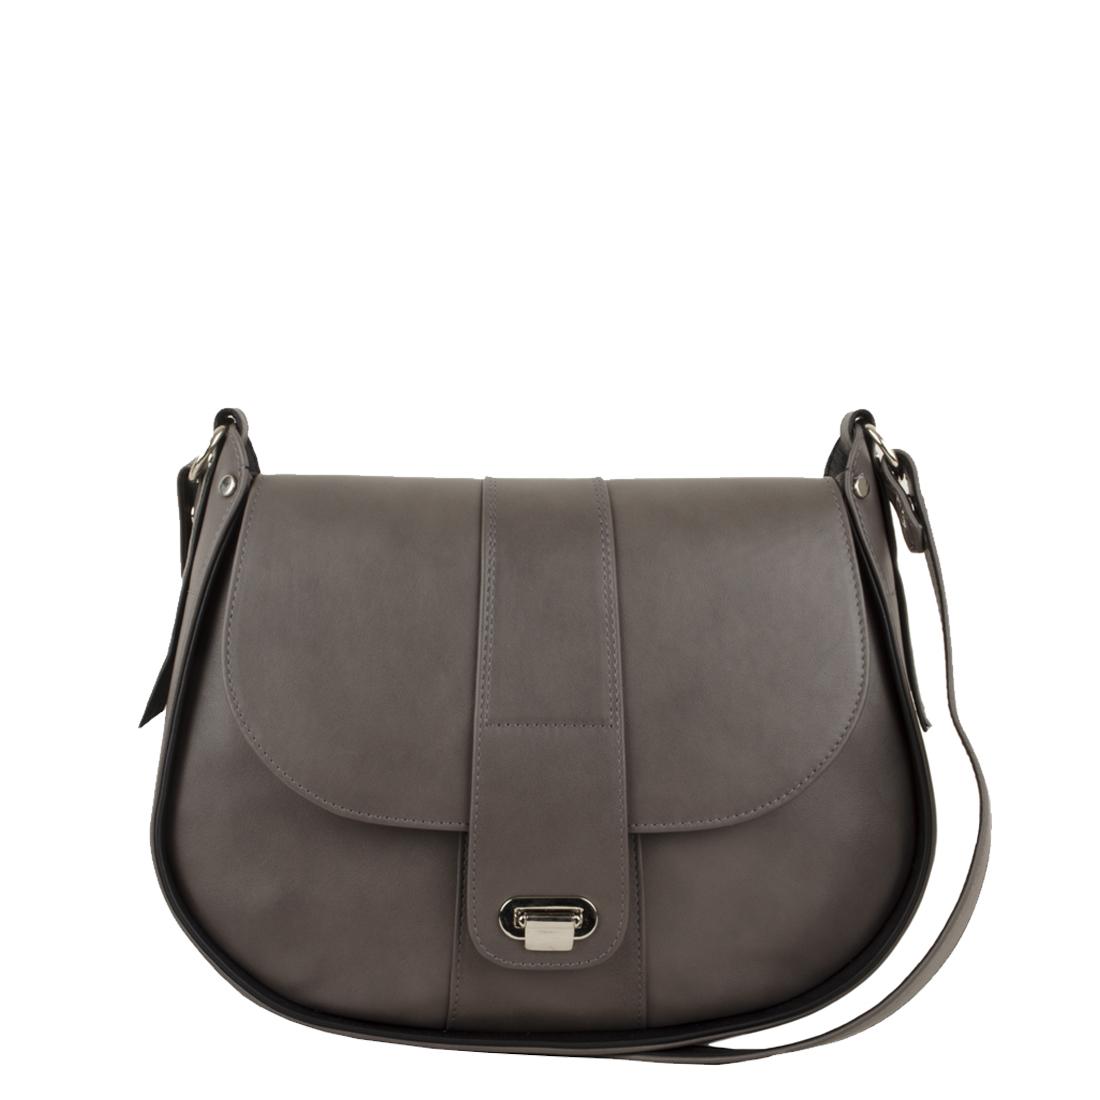 Freya Grigio Black Across Body Bag